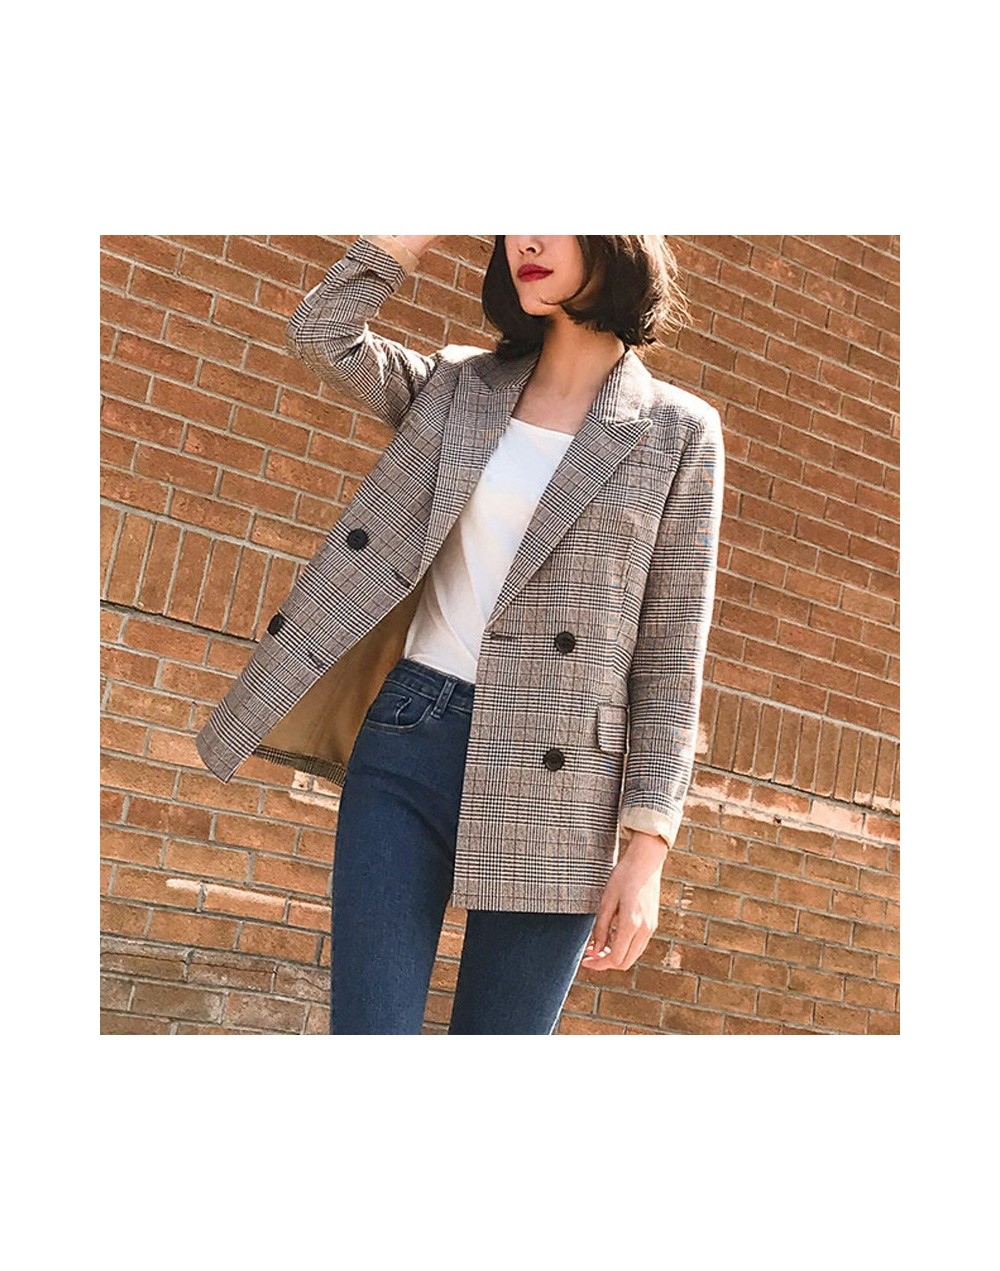 Vintage Bouble Breasted Plaid Women Blazer Spring Pockets Jackets Female Retro Suits Coat Work Feminino Outerwear high quali...